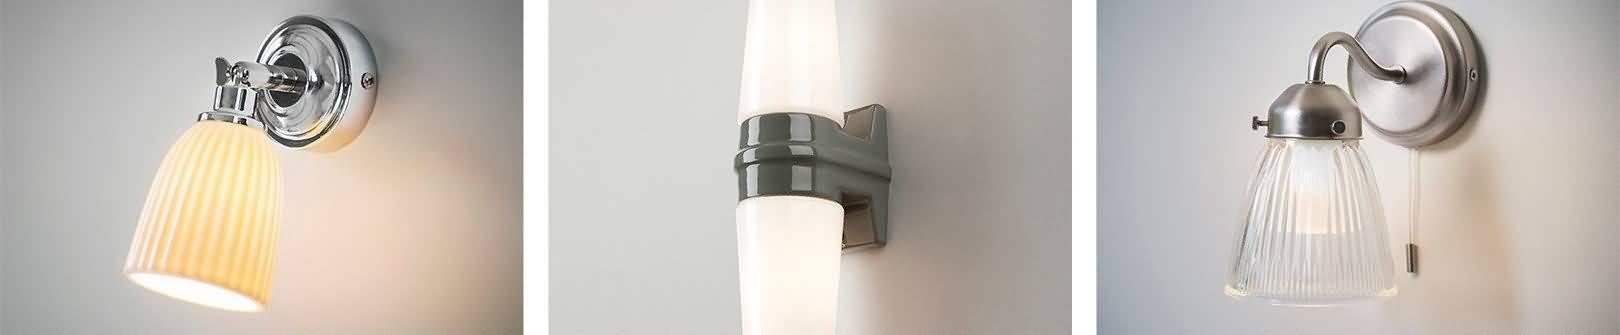 Lumières de salle de bain